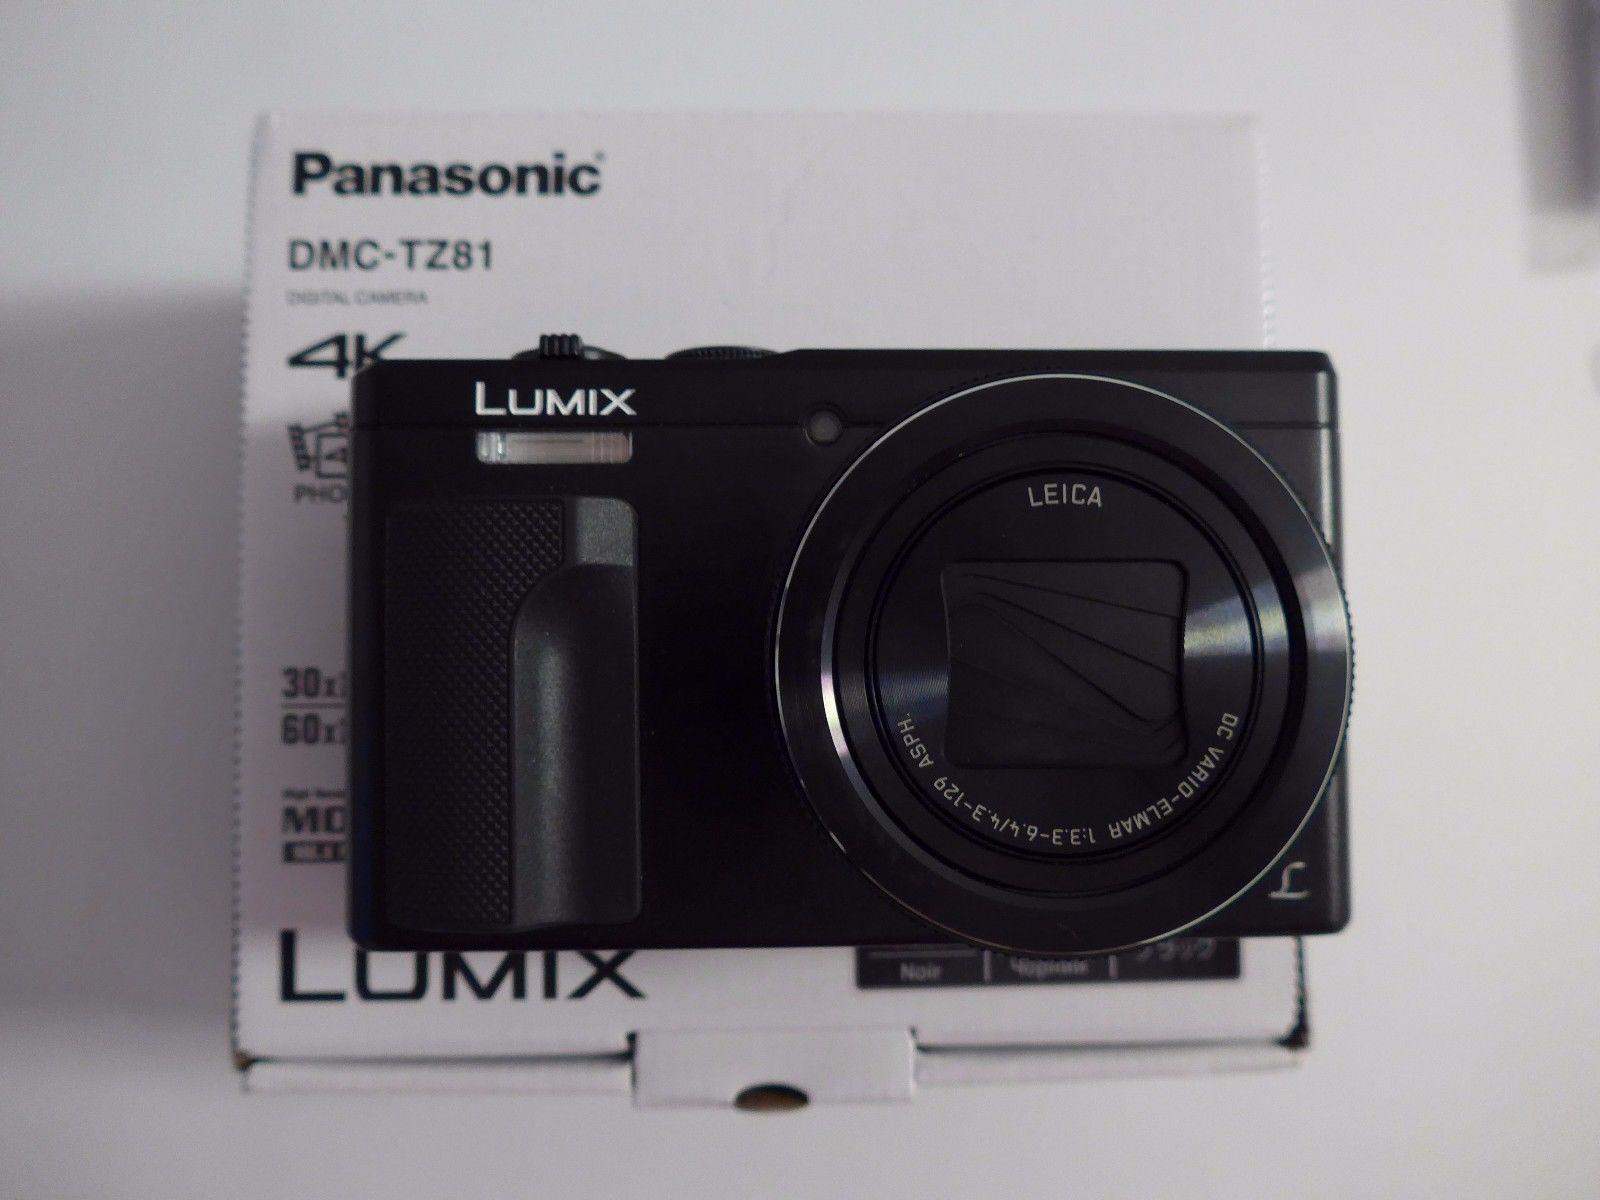 Panasonic Digitalkamera ? LUMIX DMC-TZ81 ? Aug. 2016 ? OVP